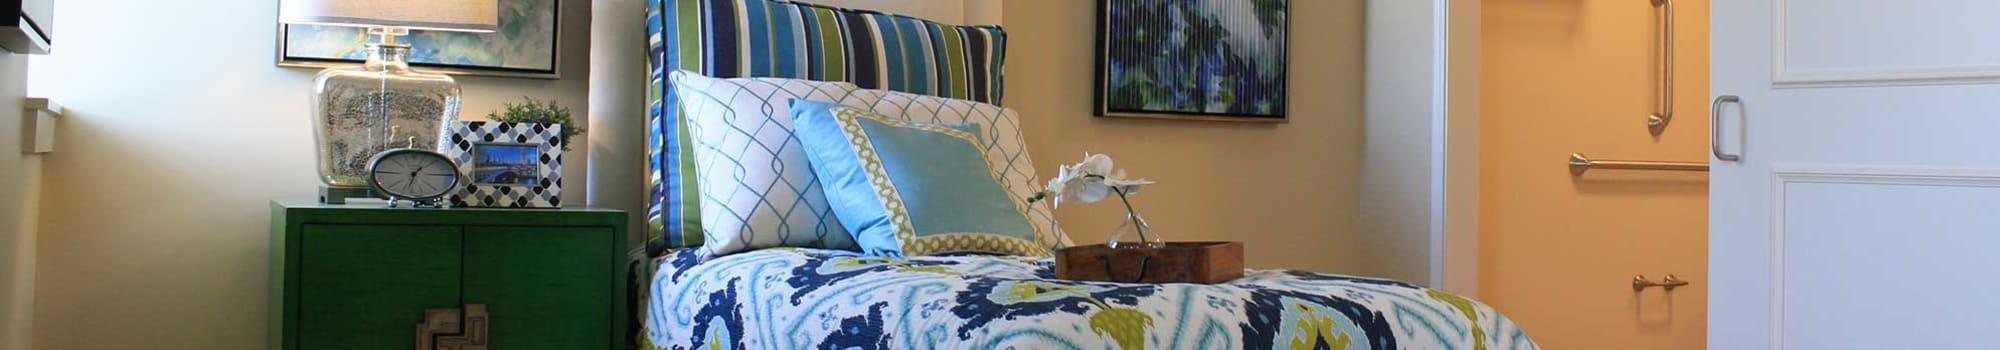 Schedule a tour of Azpira at Windermere in Windermere, Florida